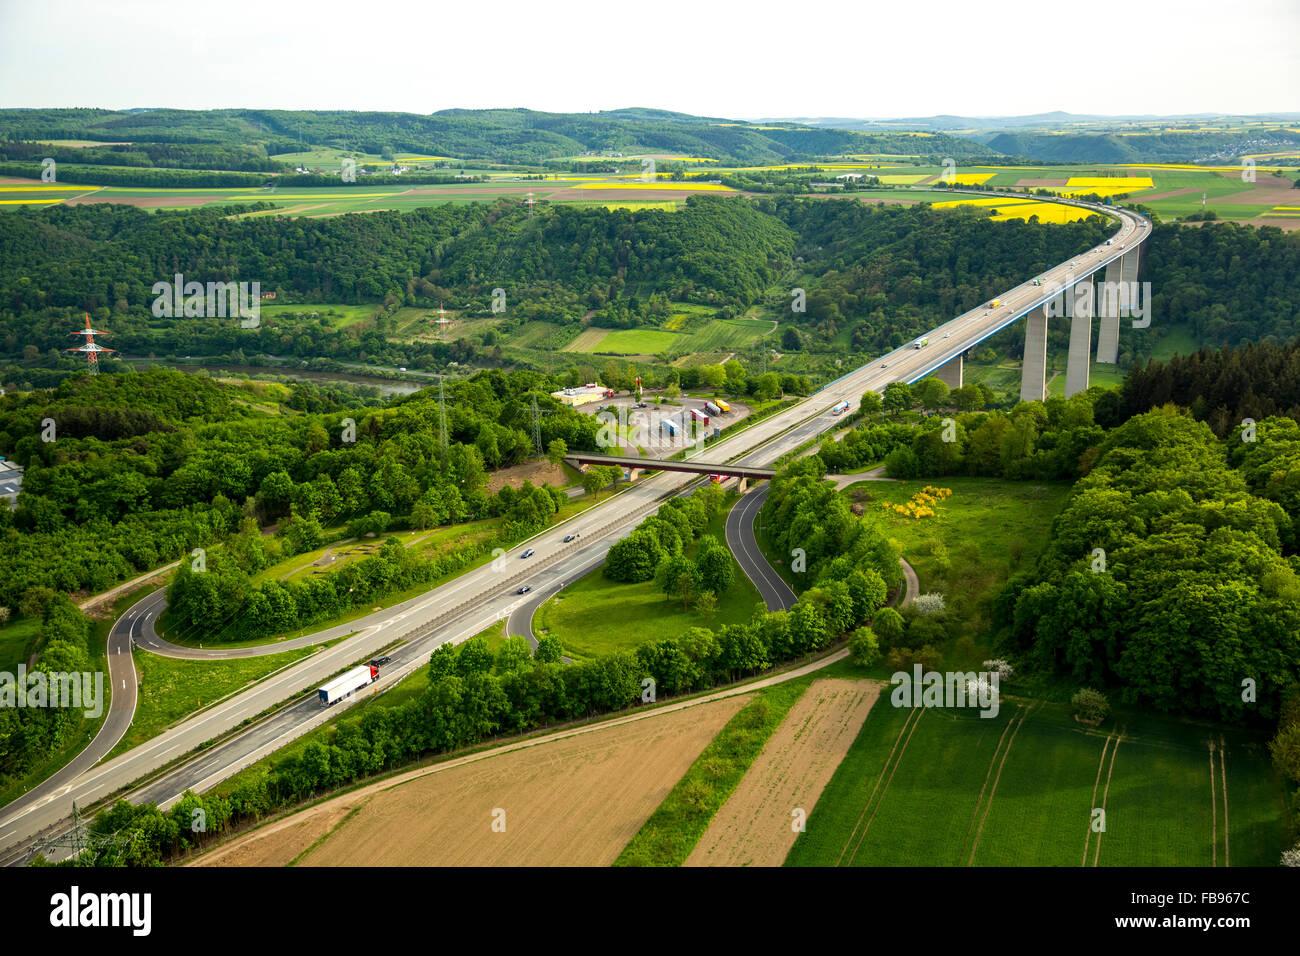 aerial view highway bridge moseltalbr cke in dieblich koblenz stock photo royalty free image. Black Bedroom Furniture Sets. Home Design Ideas